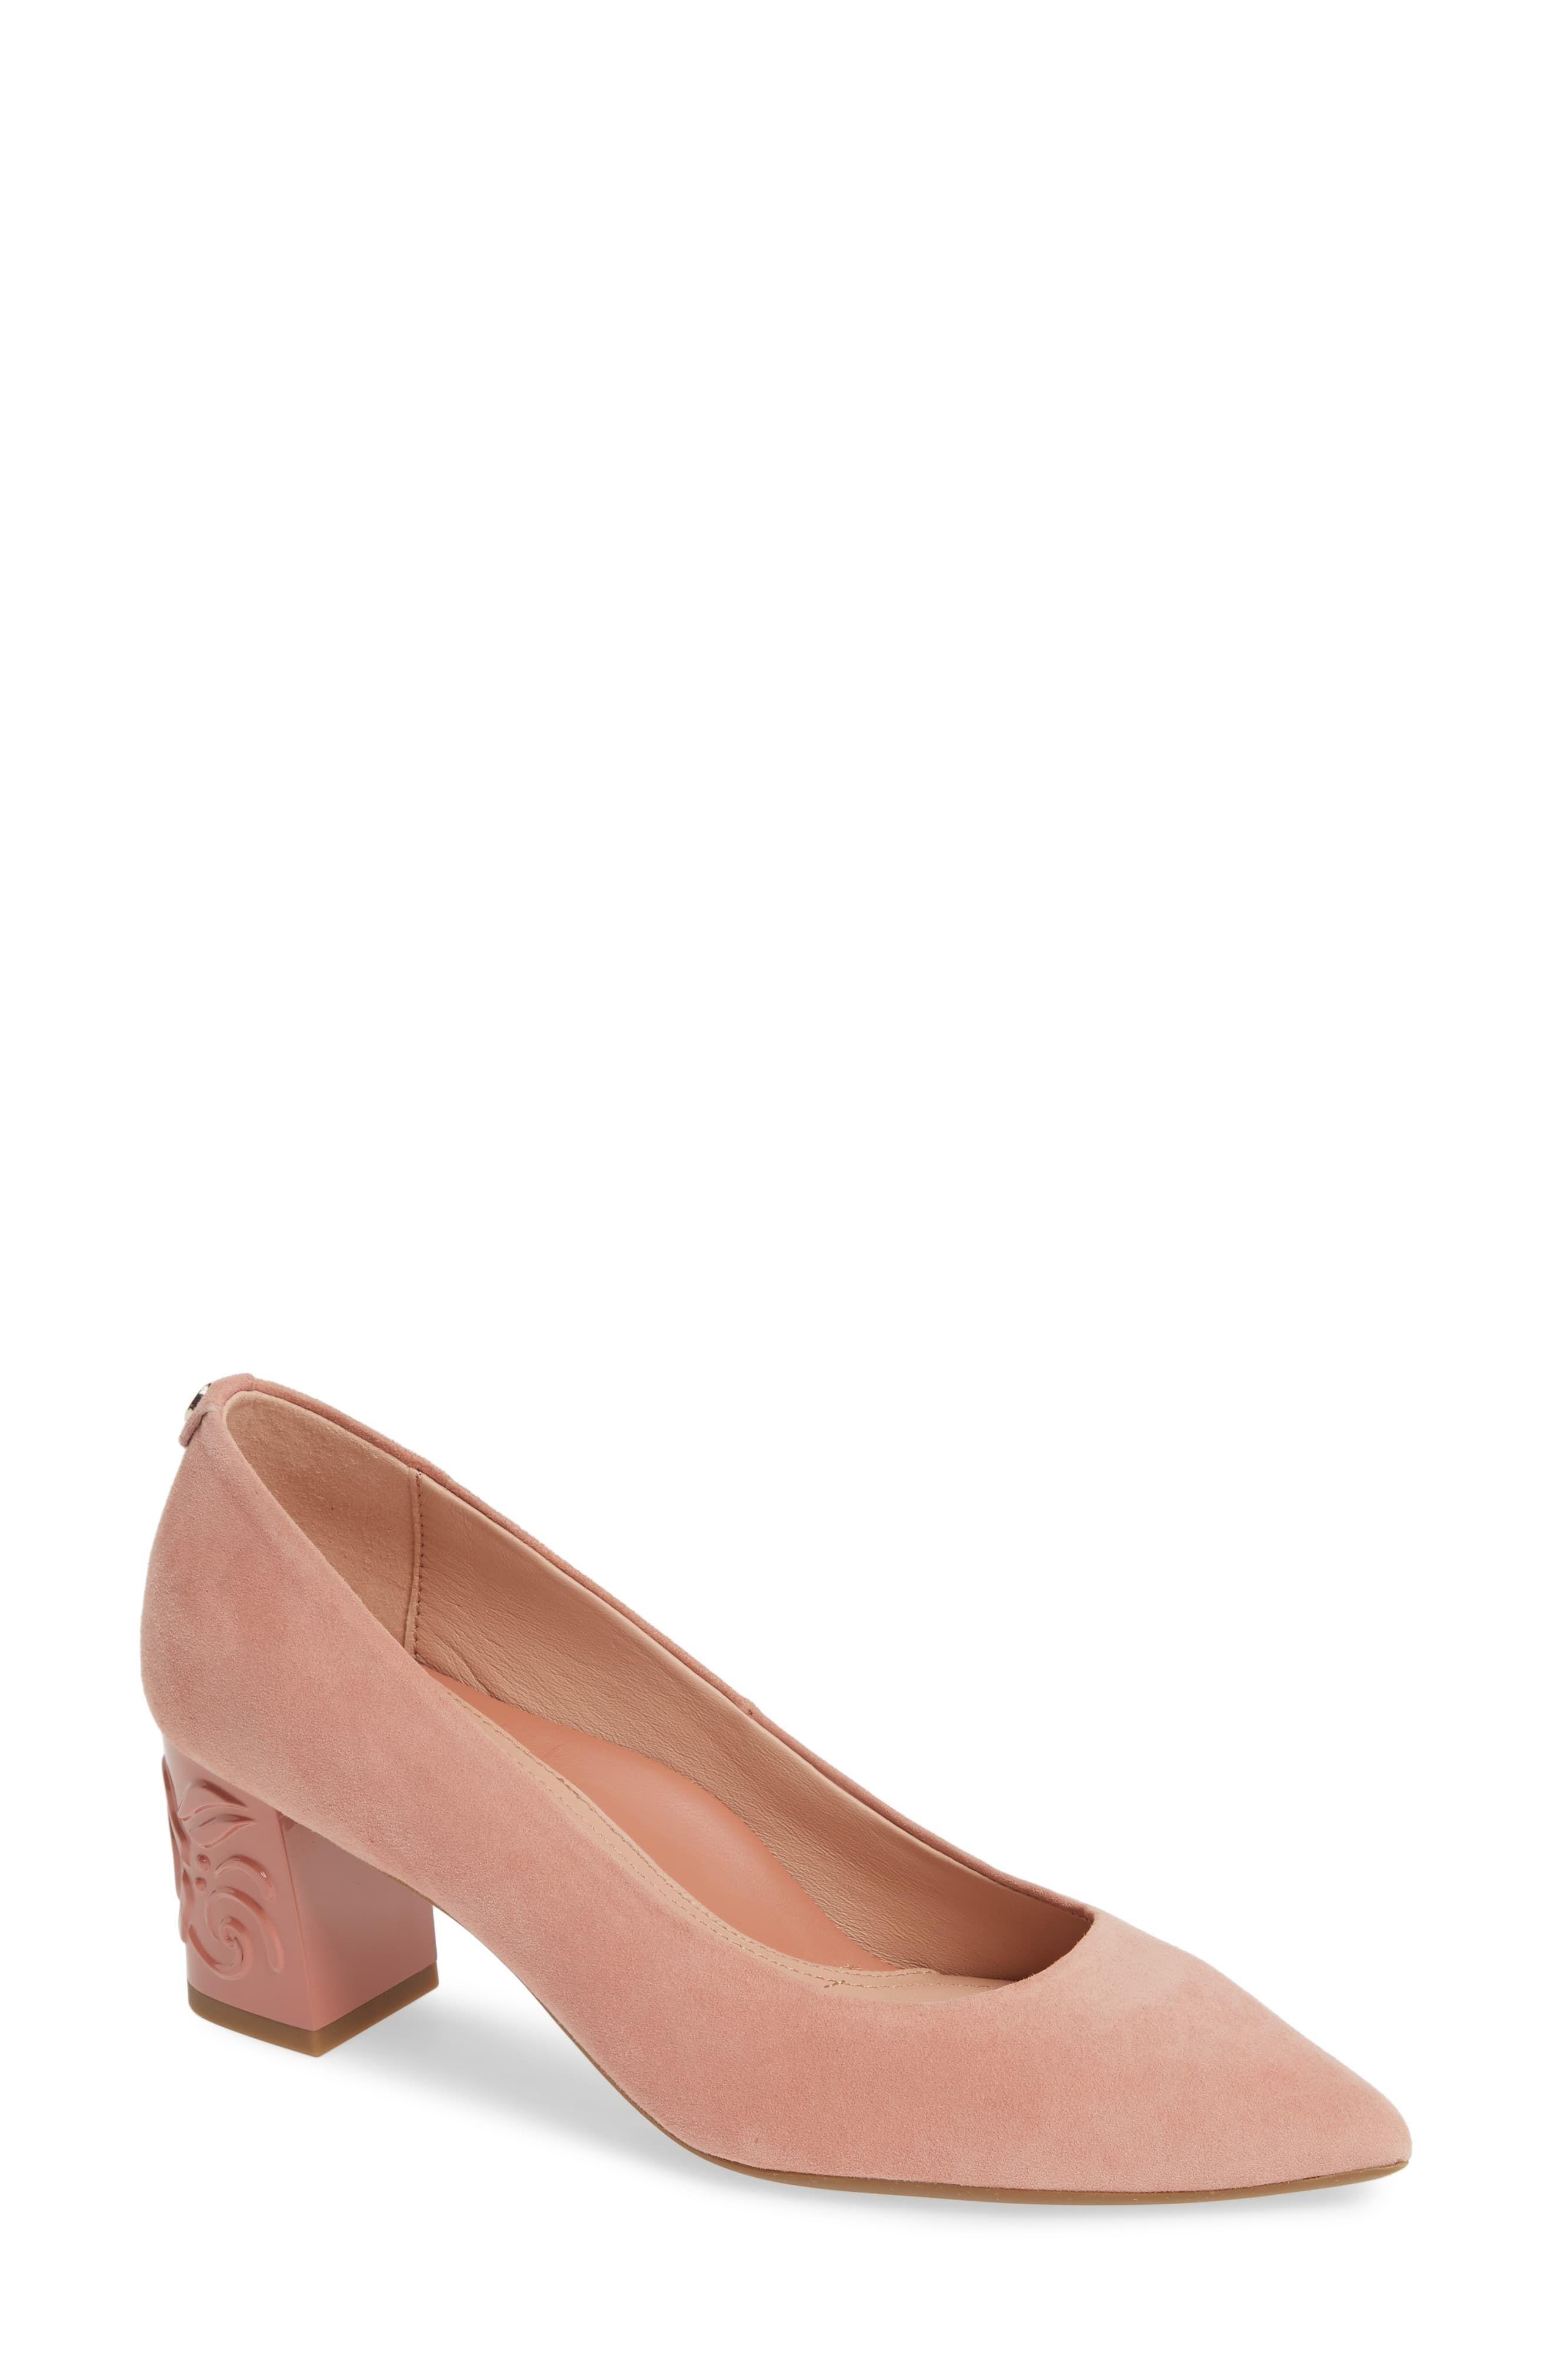 2dd2aa3790 Taryn Rose Marigold Pump in 2019 | Products | Taryn rose shoes ...